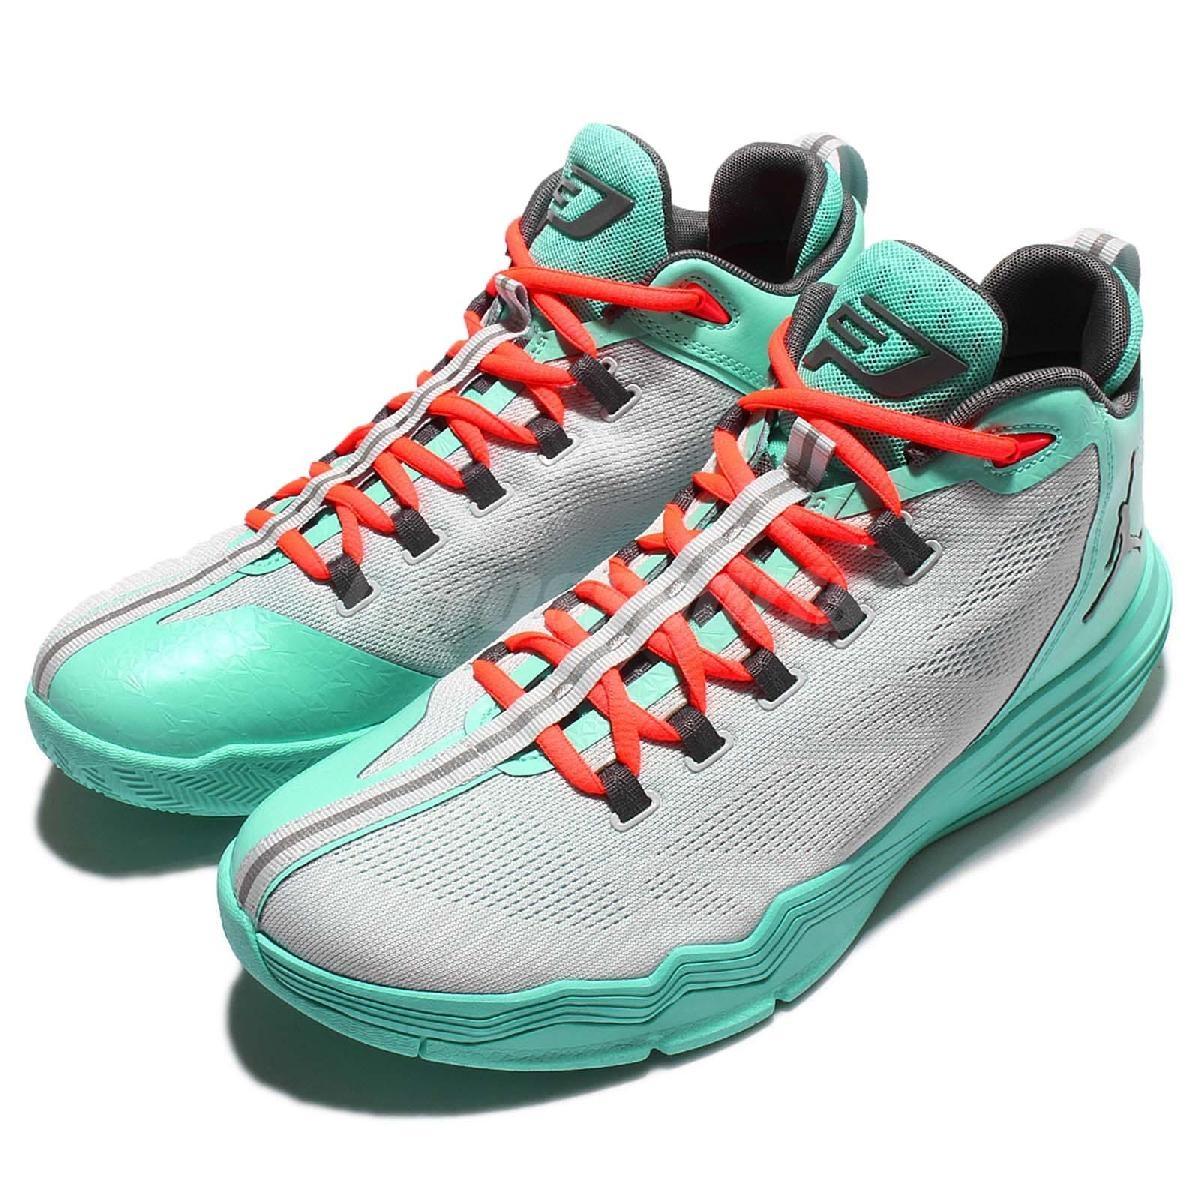 Nike籃球鞋Jordan CP3.IX AE X XDR 9代室外耐磨氣墊灰綠男鞋PUMP306 845340-016